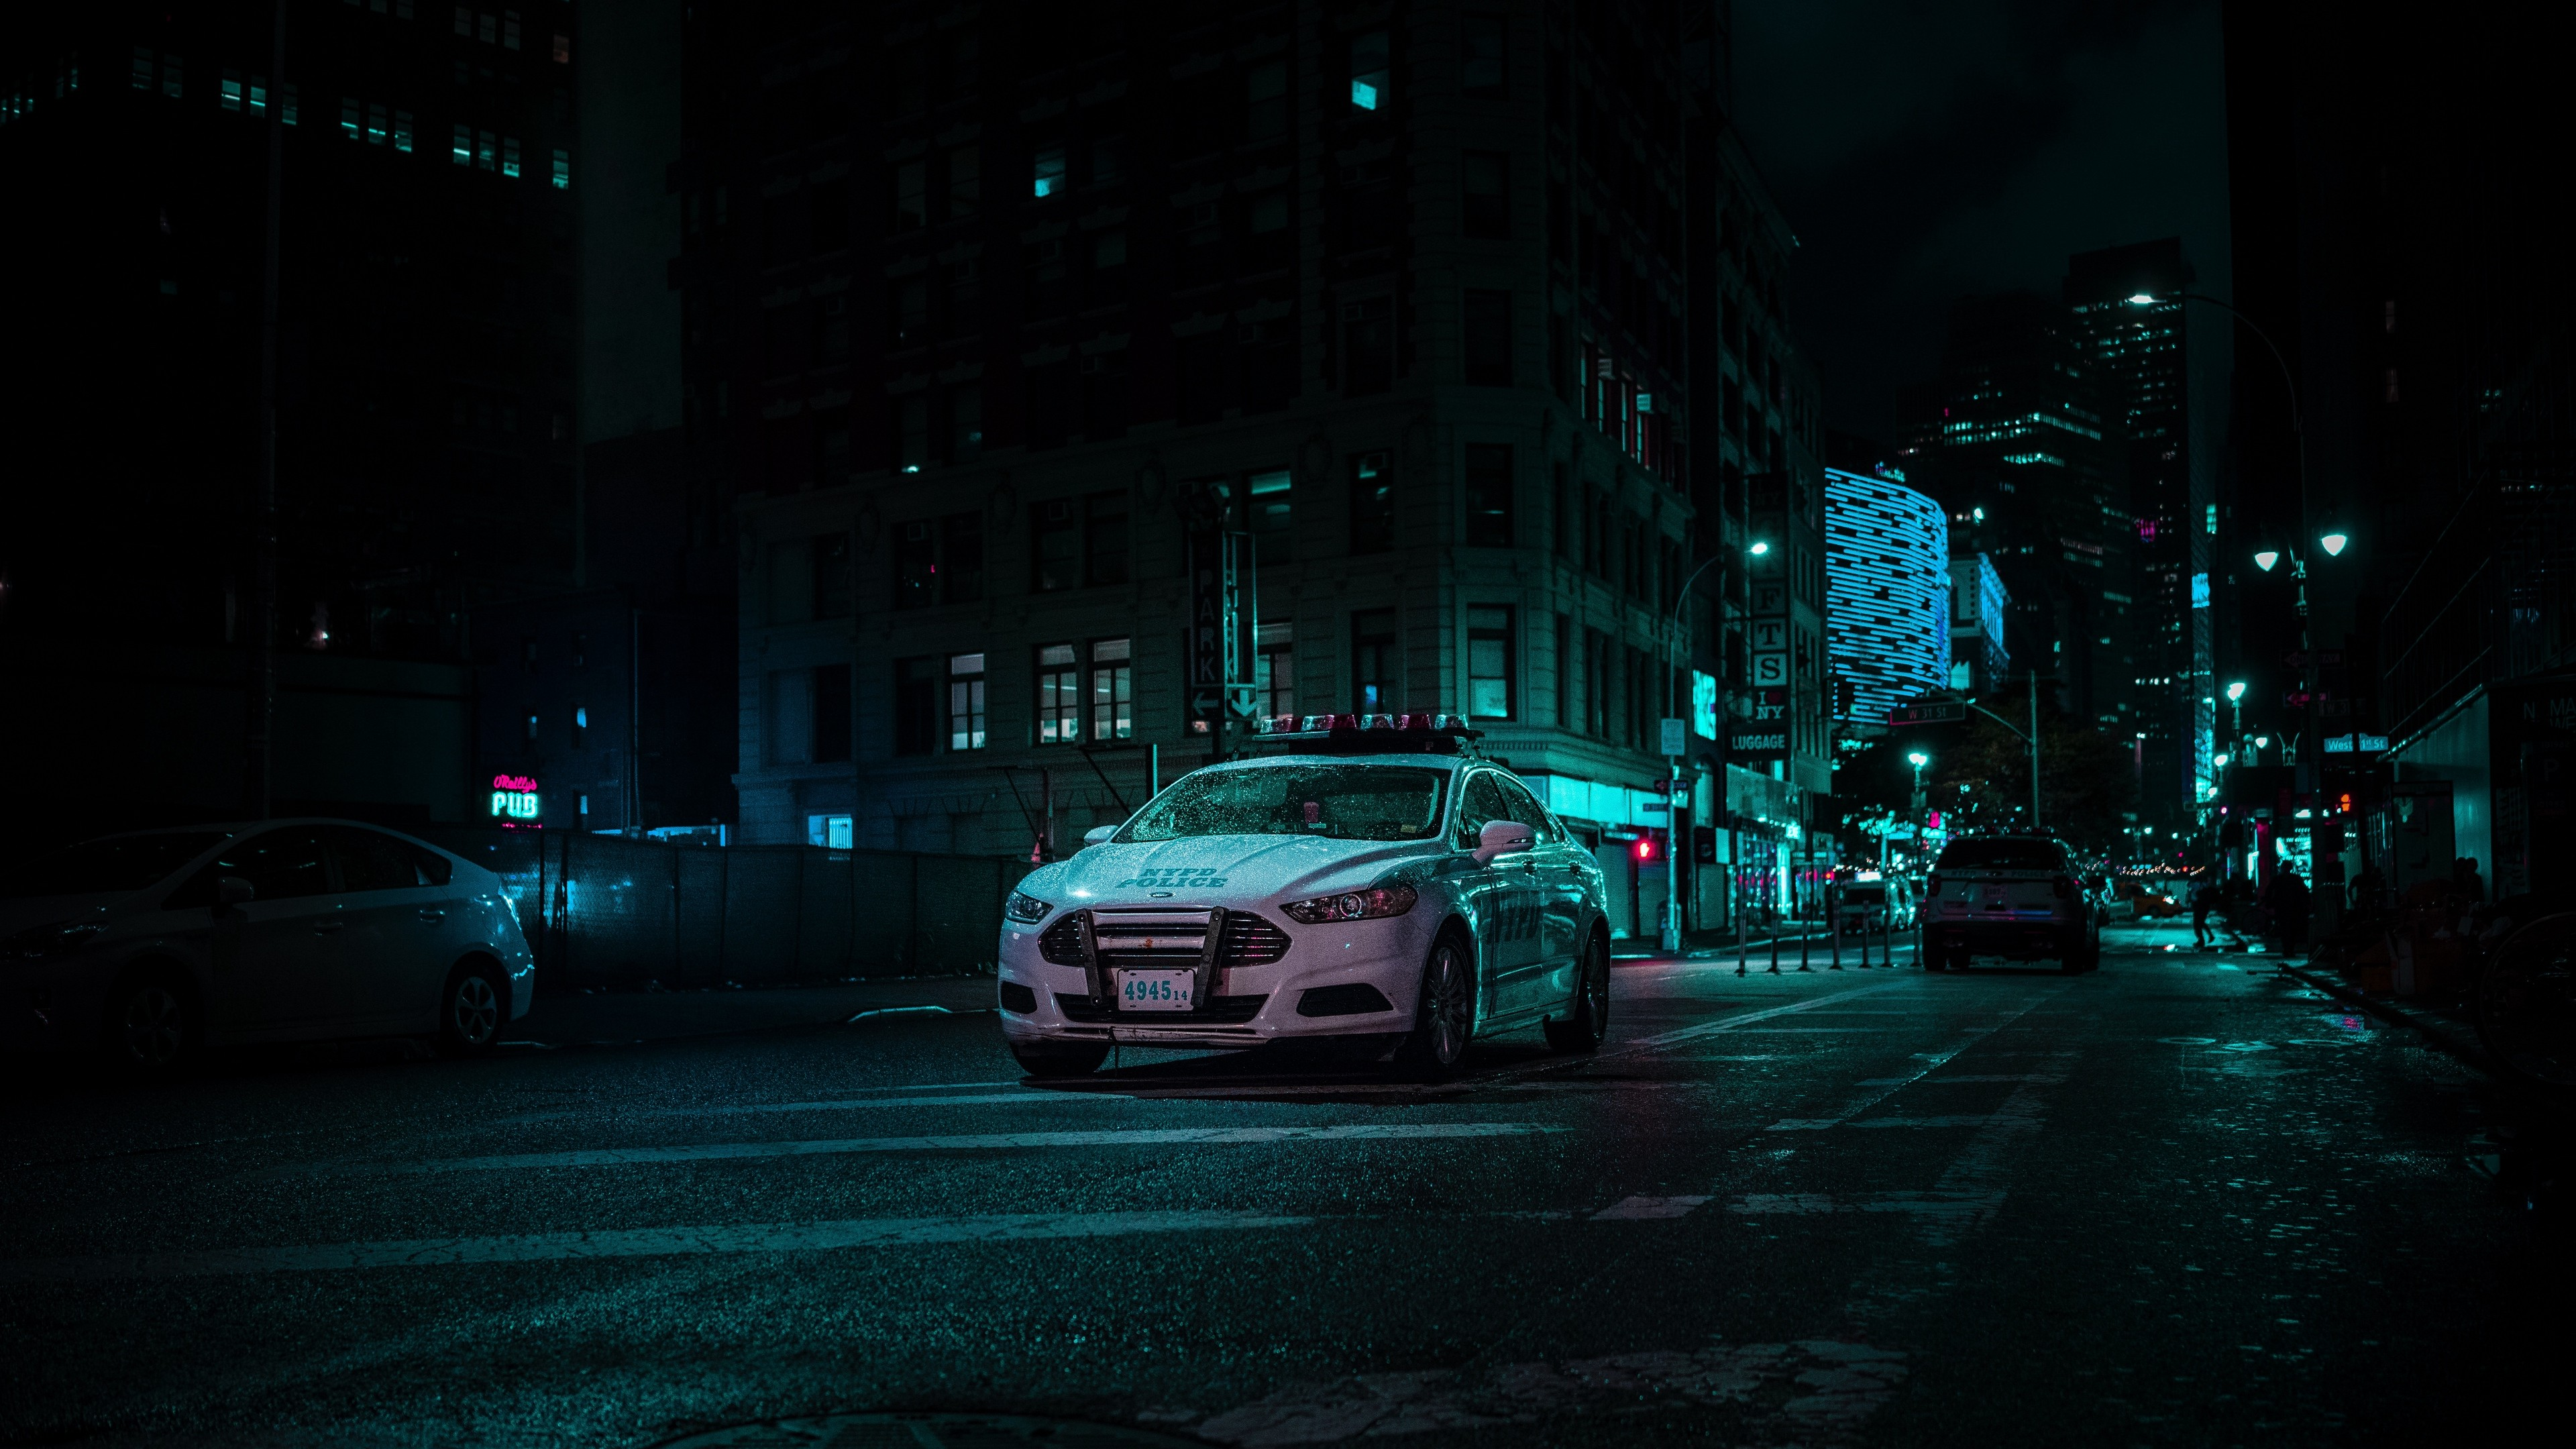 4k Car Police Night City Wallpaper 3840x2160